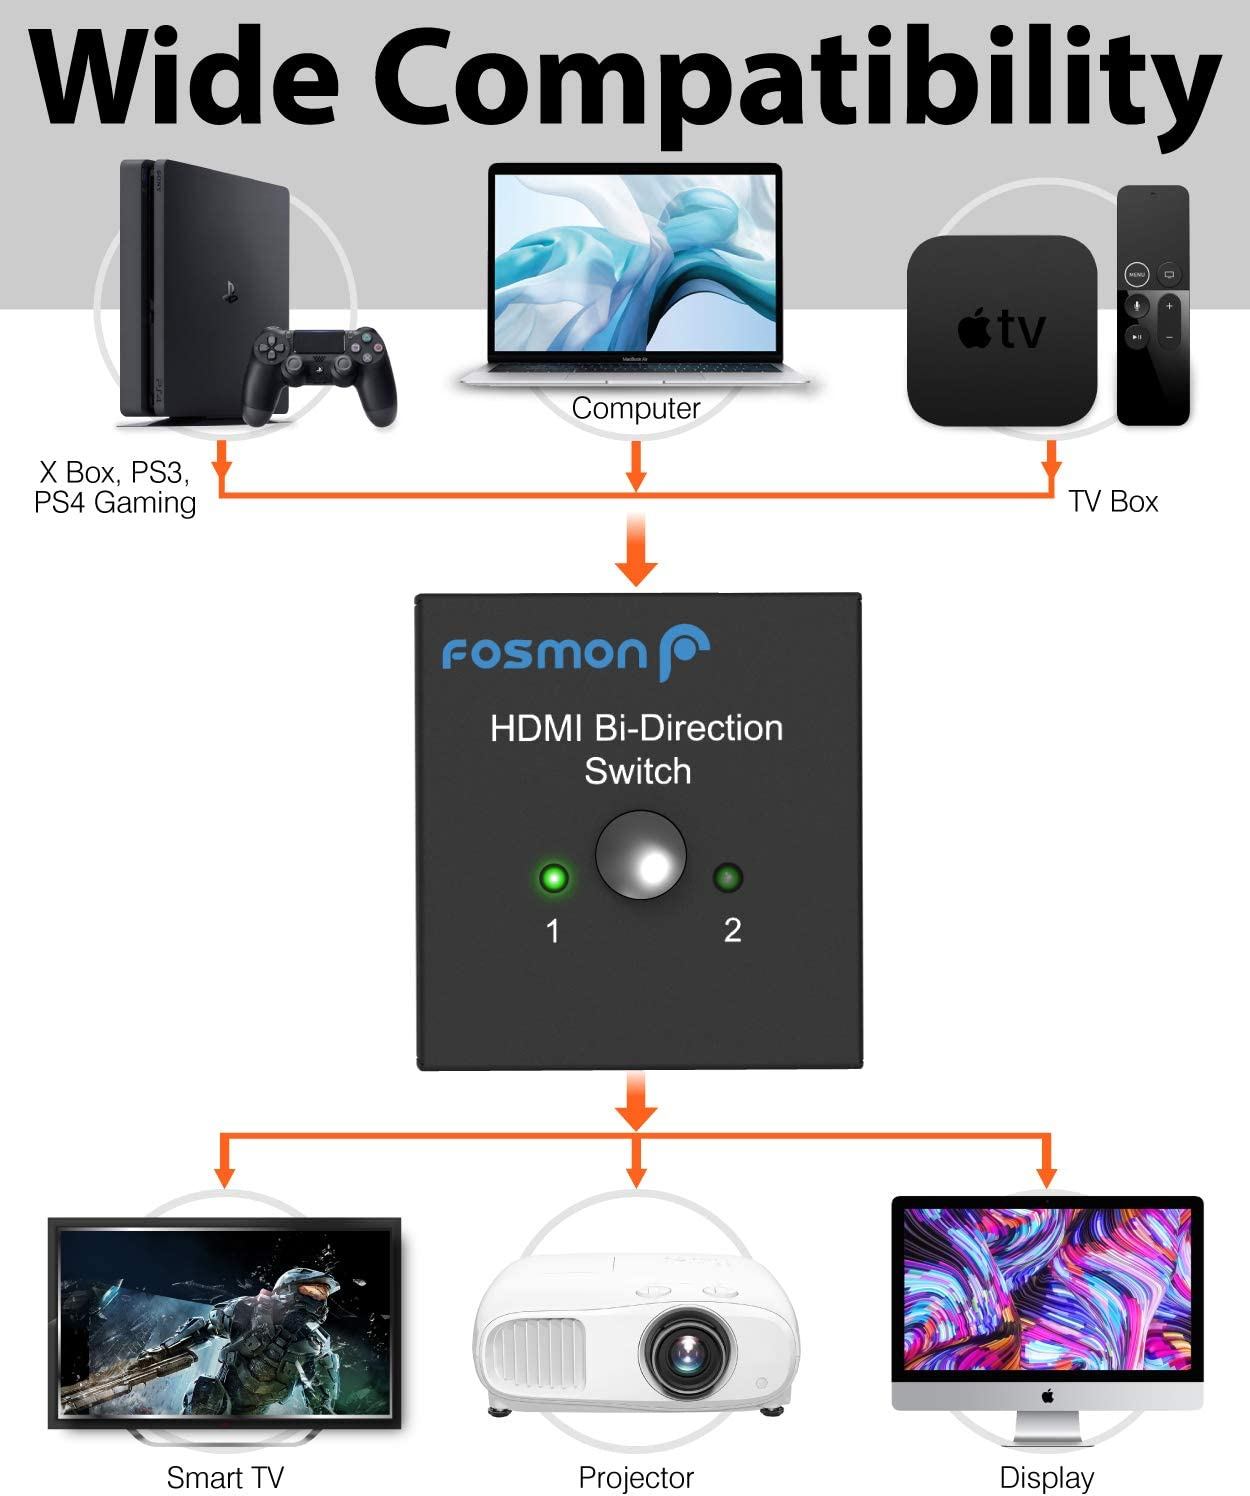 Fosmon 4 K HDMI Switch 2 Port Bi-Directional Switcher Splitter [HDMI 2.0 Standard, Ultra HD 4Kx2K@60Hz 3D]: Amazon.es: Electrónica